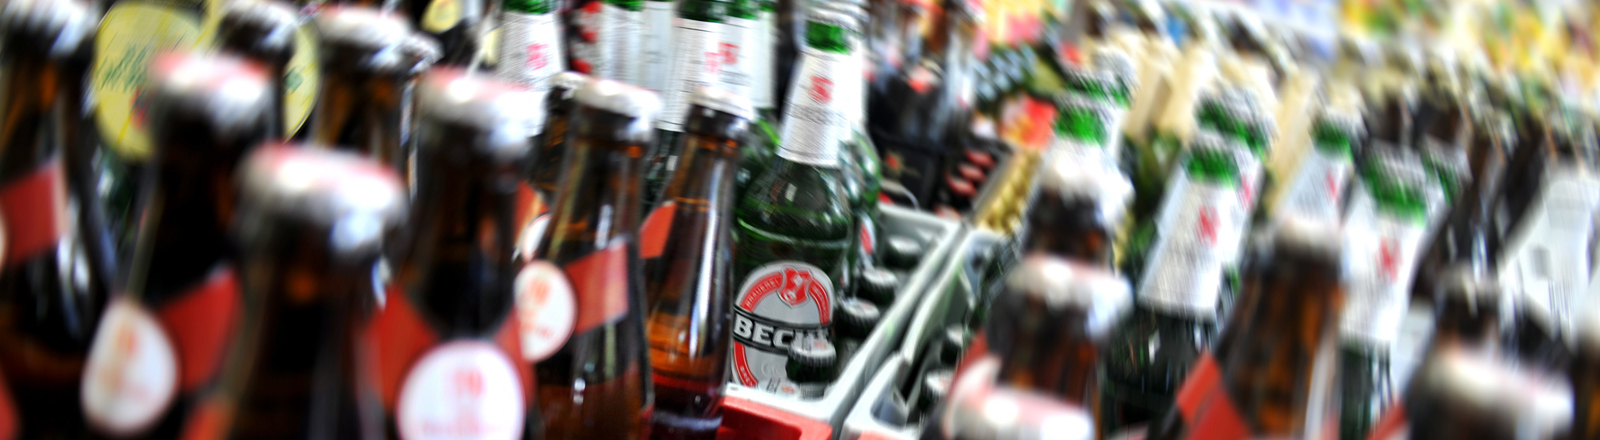 Bierflaschen stehen am 04.10.2013 in Berlin in einem Kiosk in Kreuzberg.